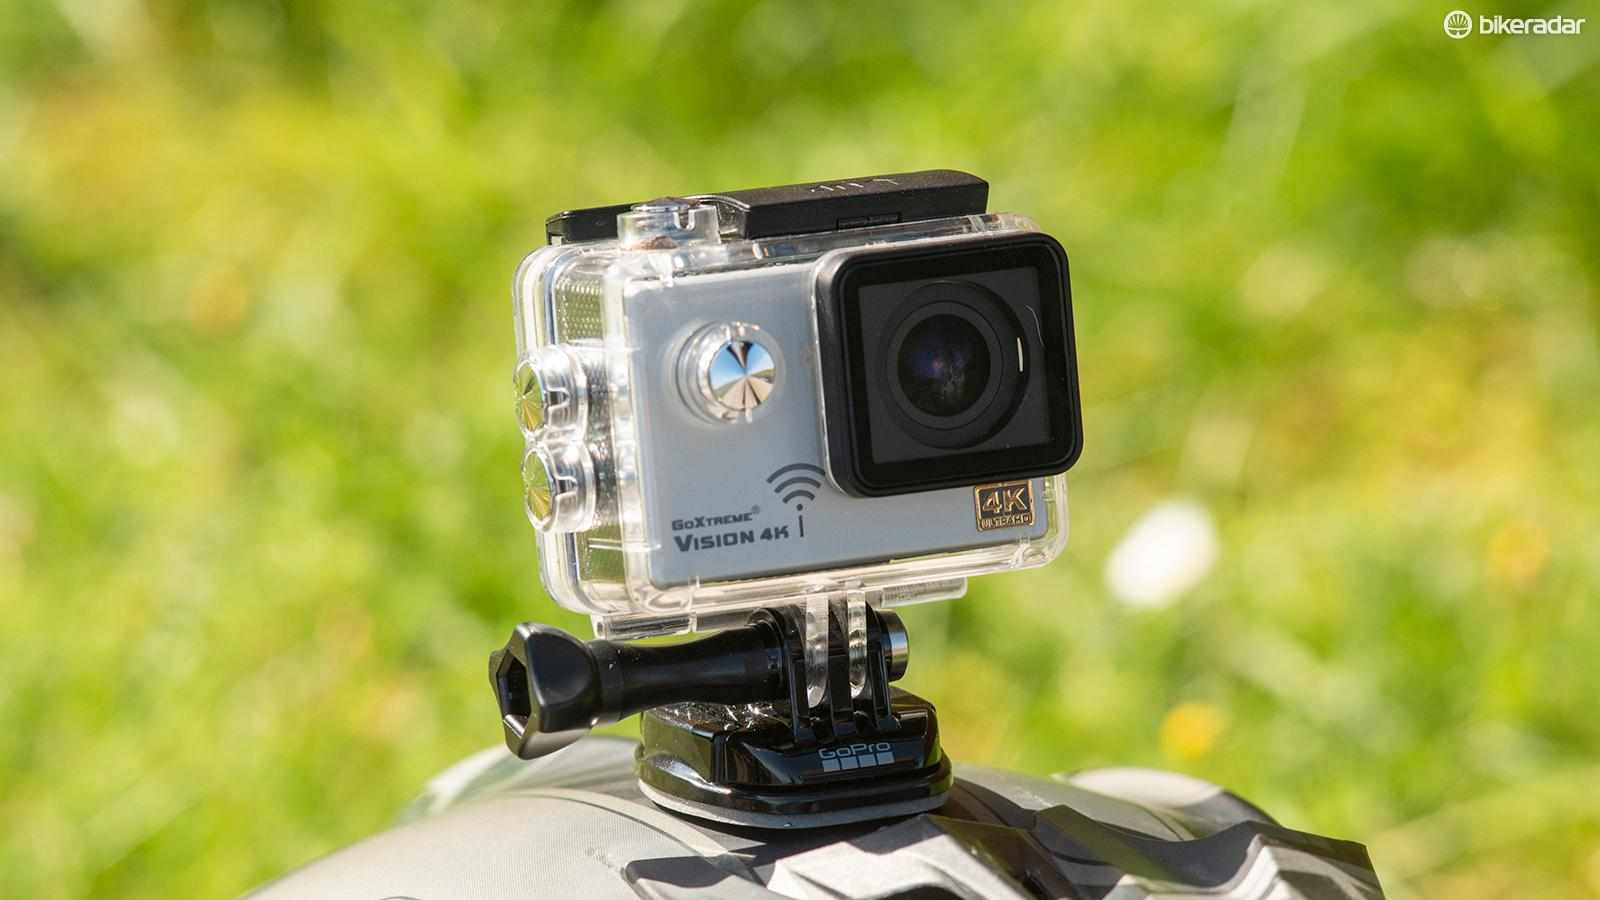 The GoXtreme Vision 4K action camera